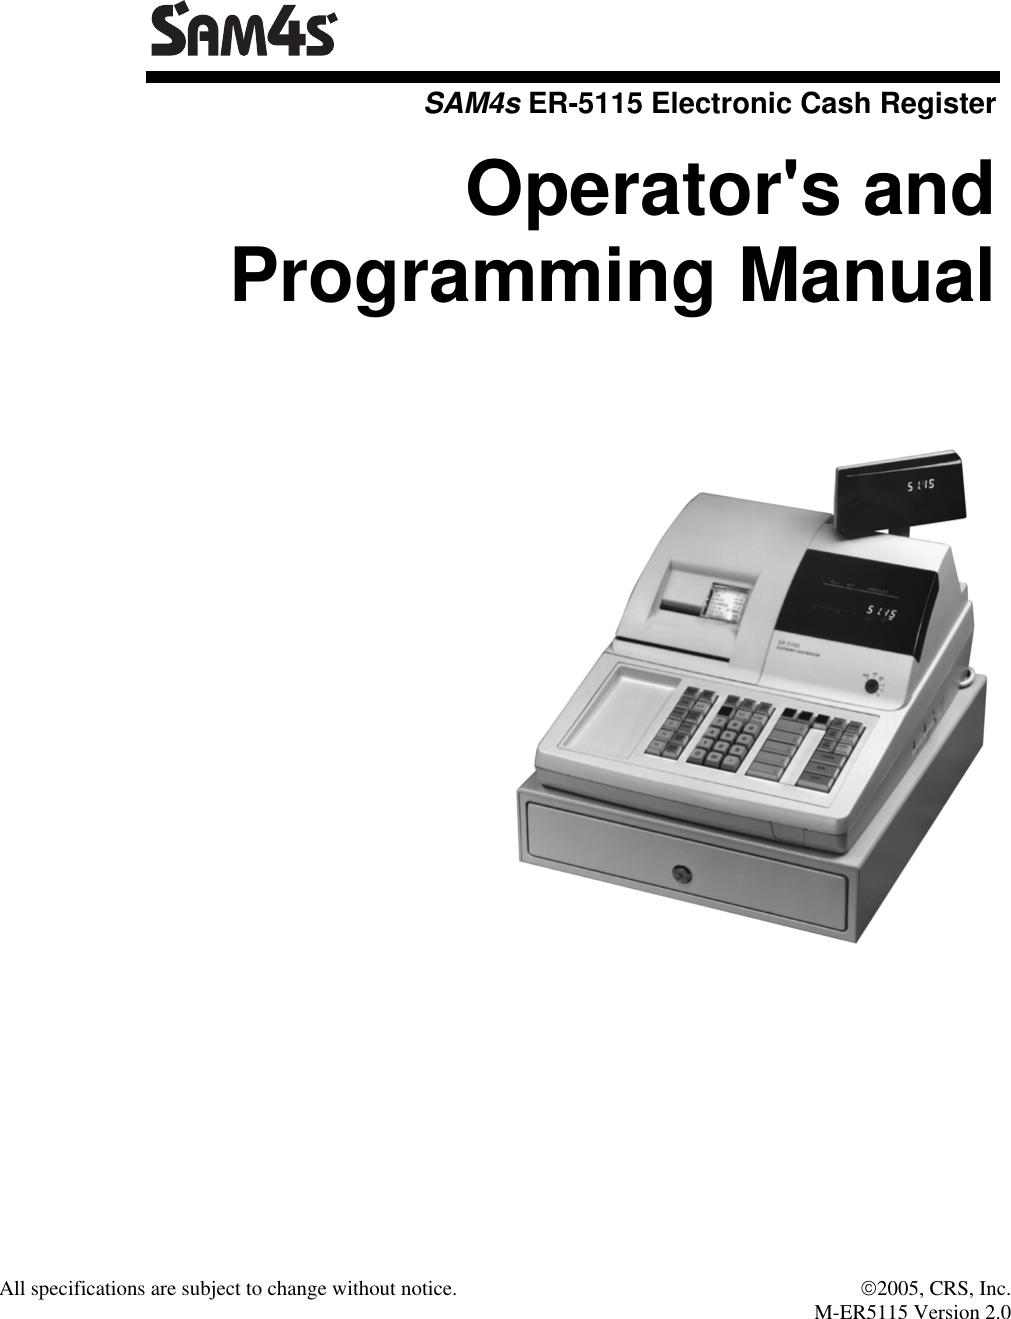 sam4s cash register manual